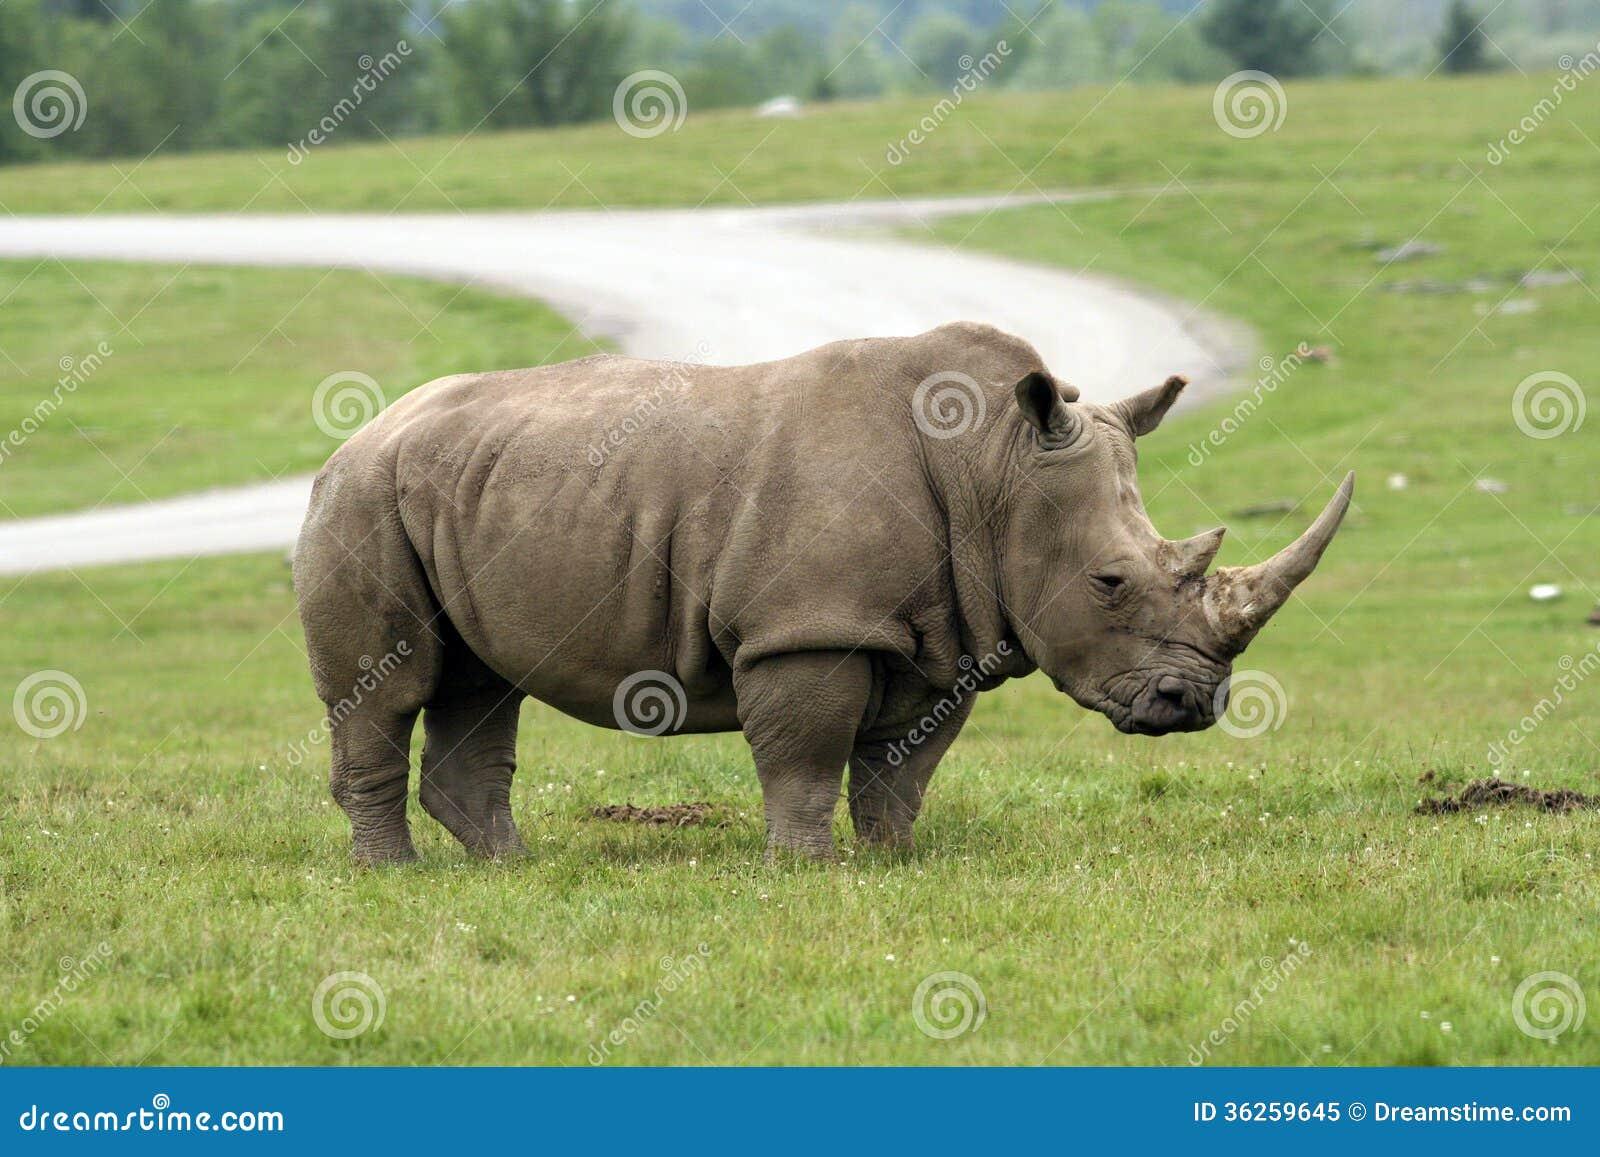 Download Rhinoceros stock image. Image of face, conservation, safari - 36259645